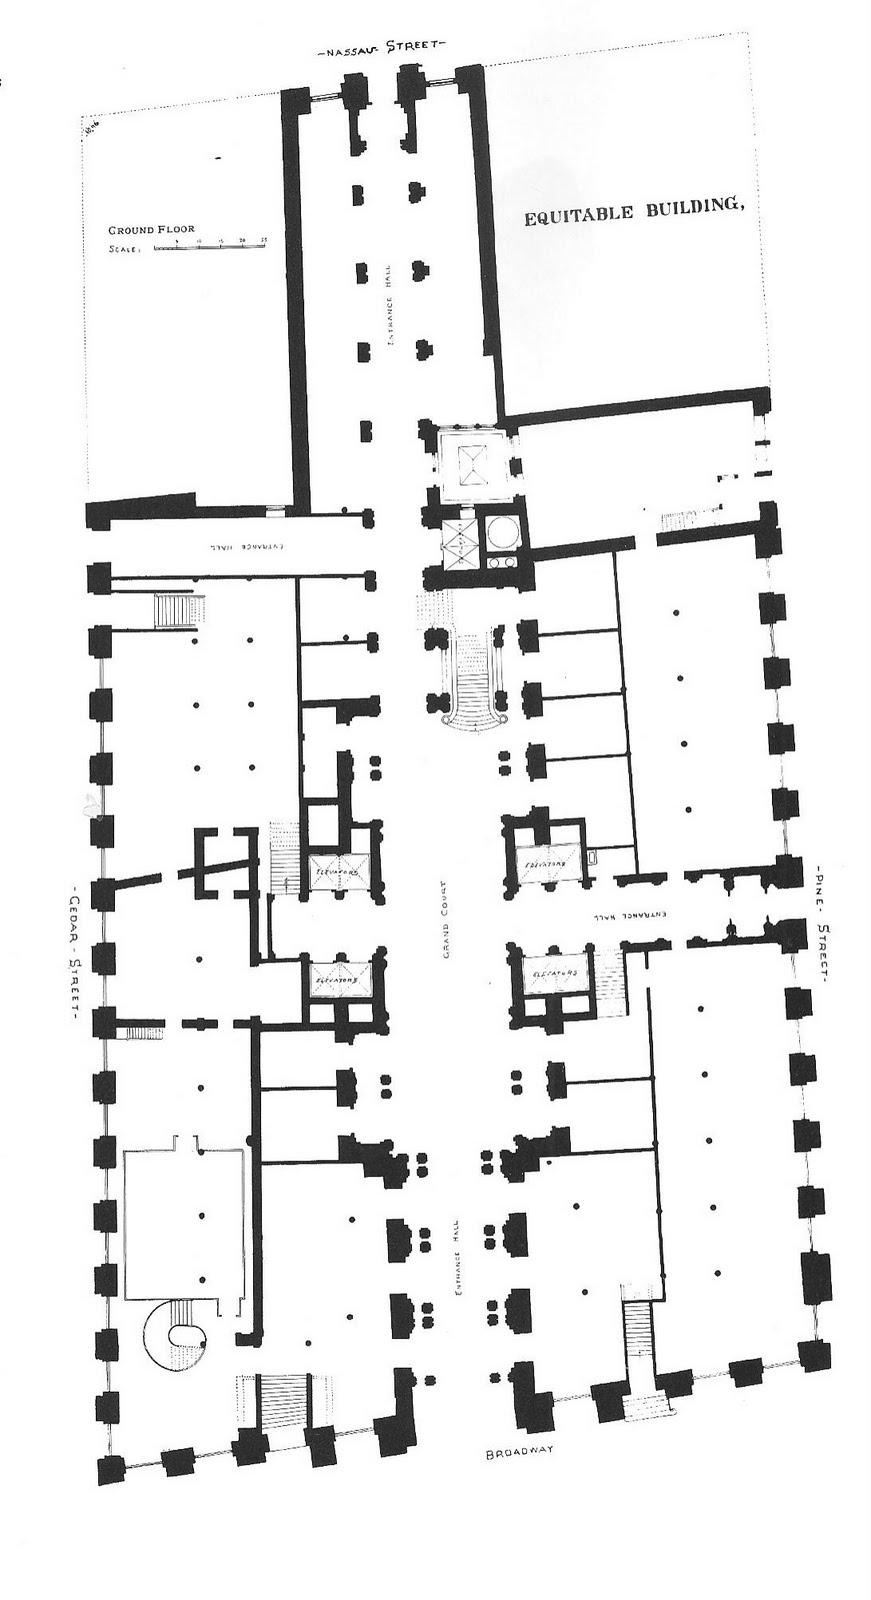 10 Floors Building Plant